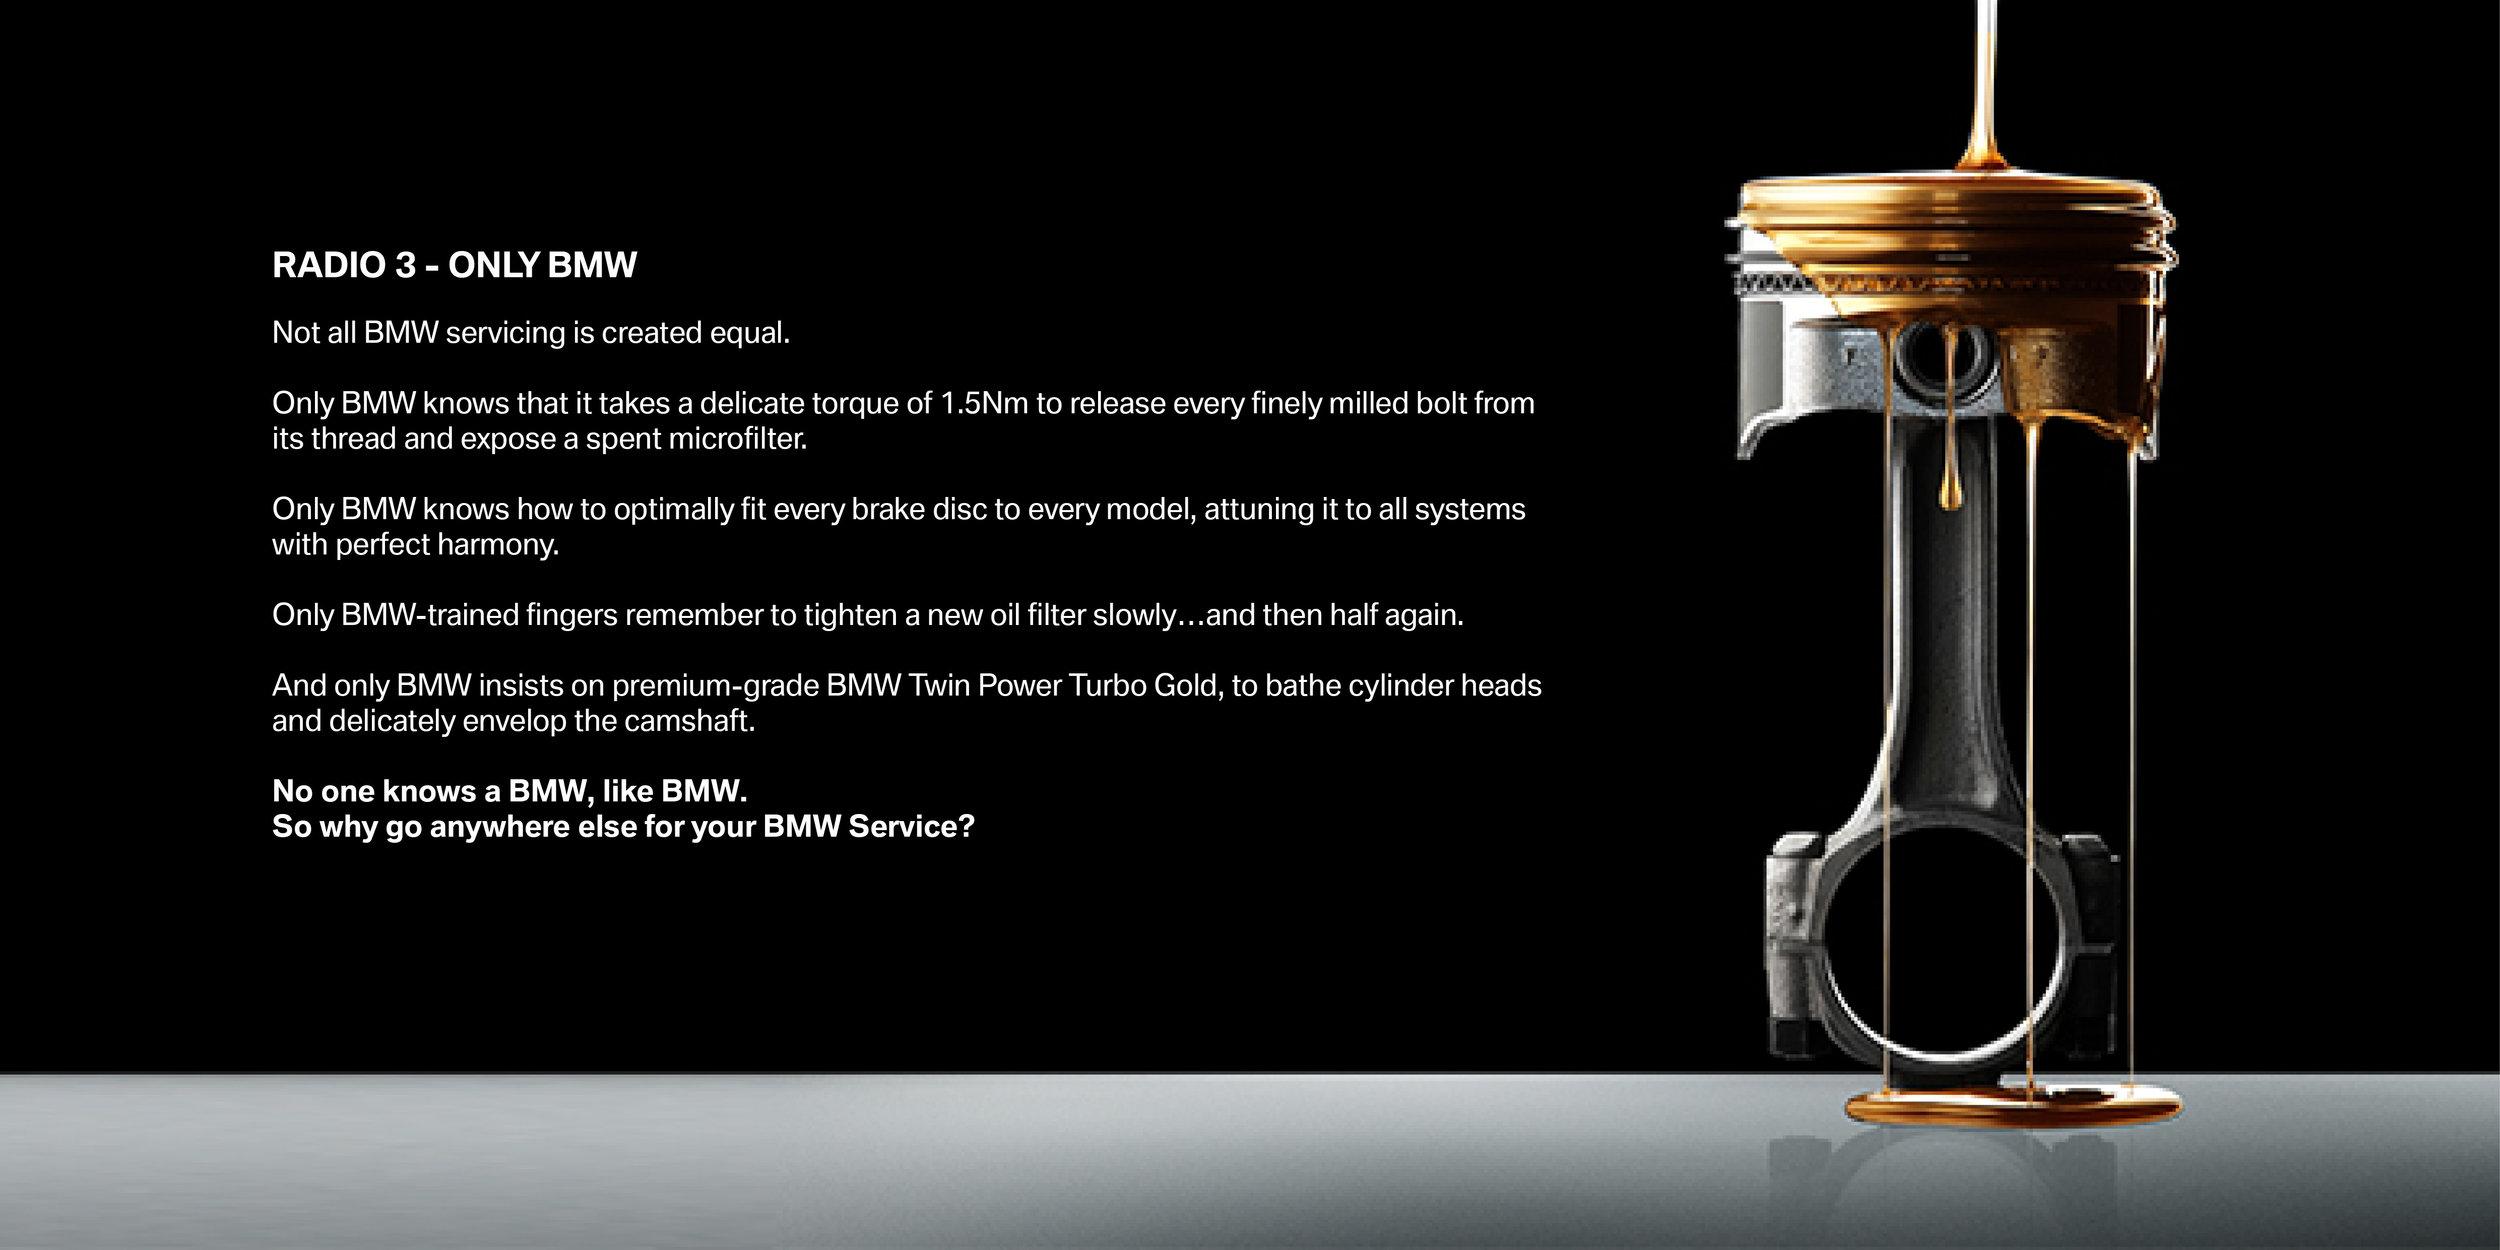 BMW Aftercare radio3.jpg